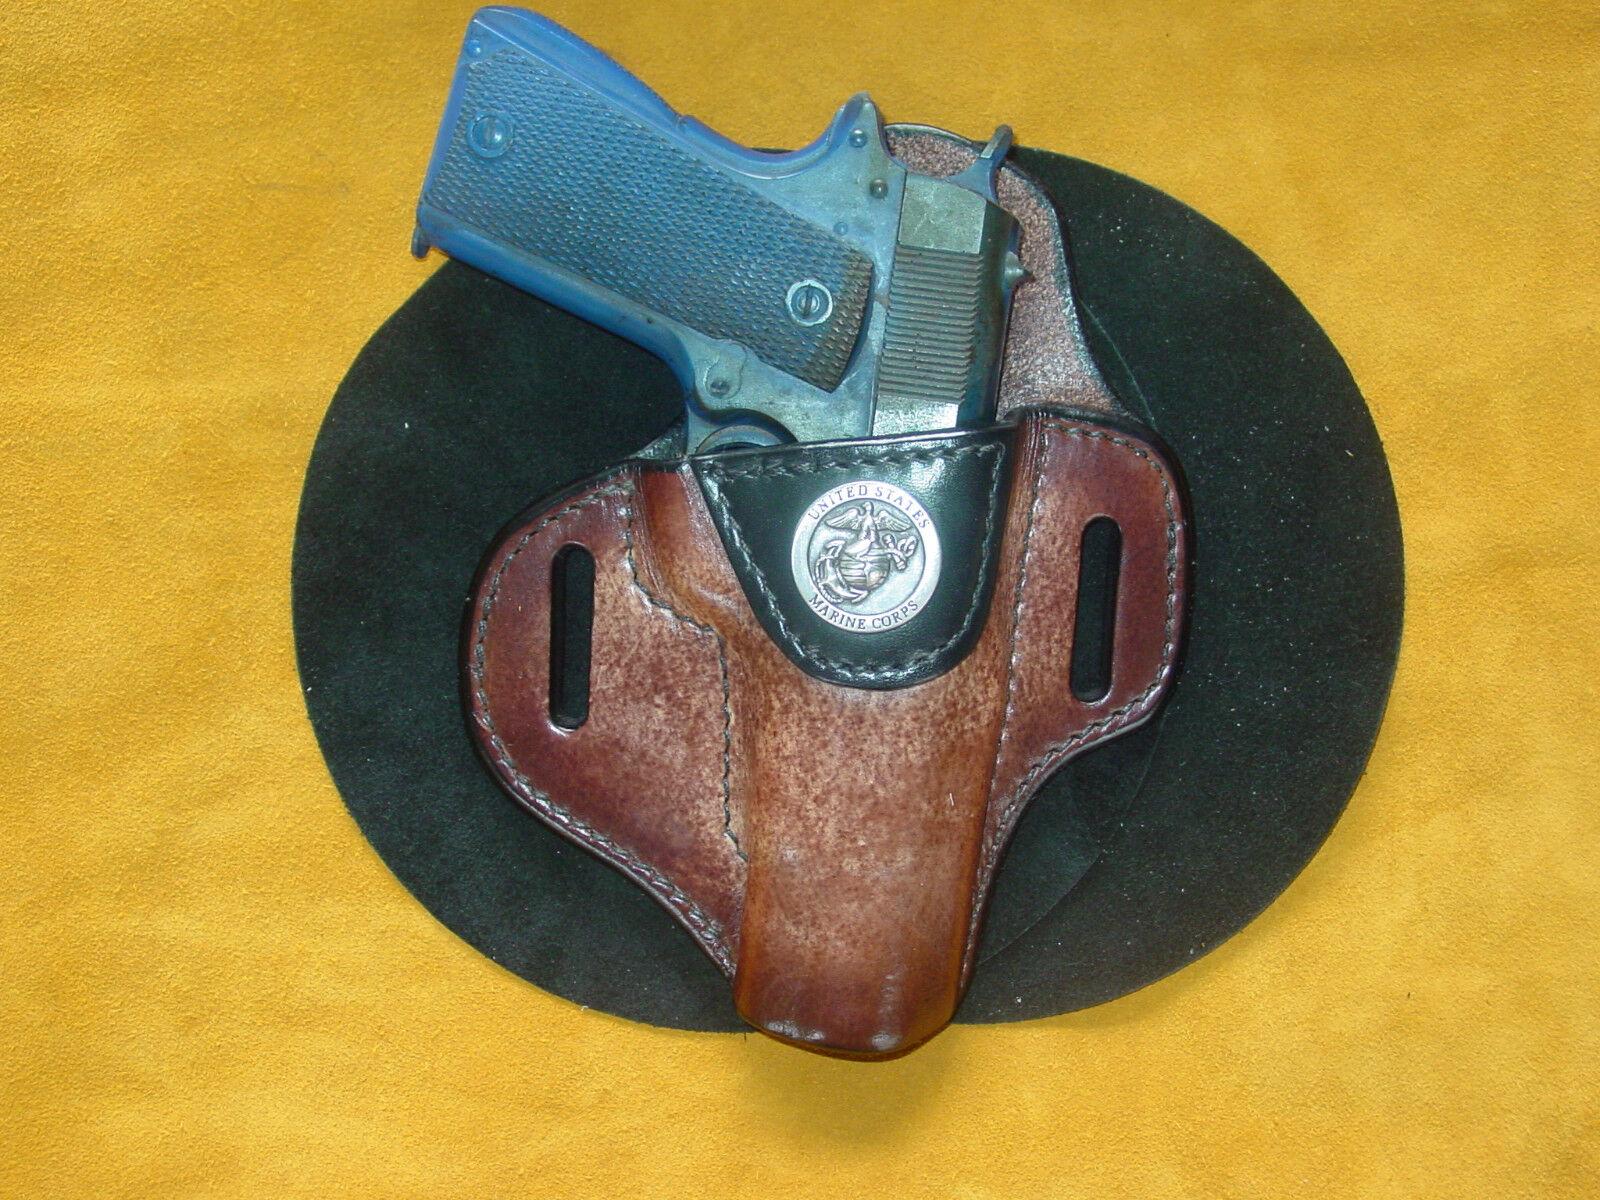 Colt Sig Springfield 1911 completo tamaño 5  Funda Marine Bruño Brn Kwik y Gratis